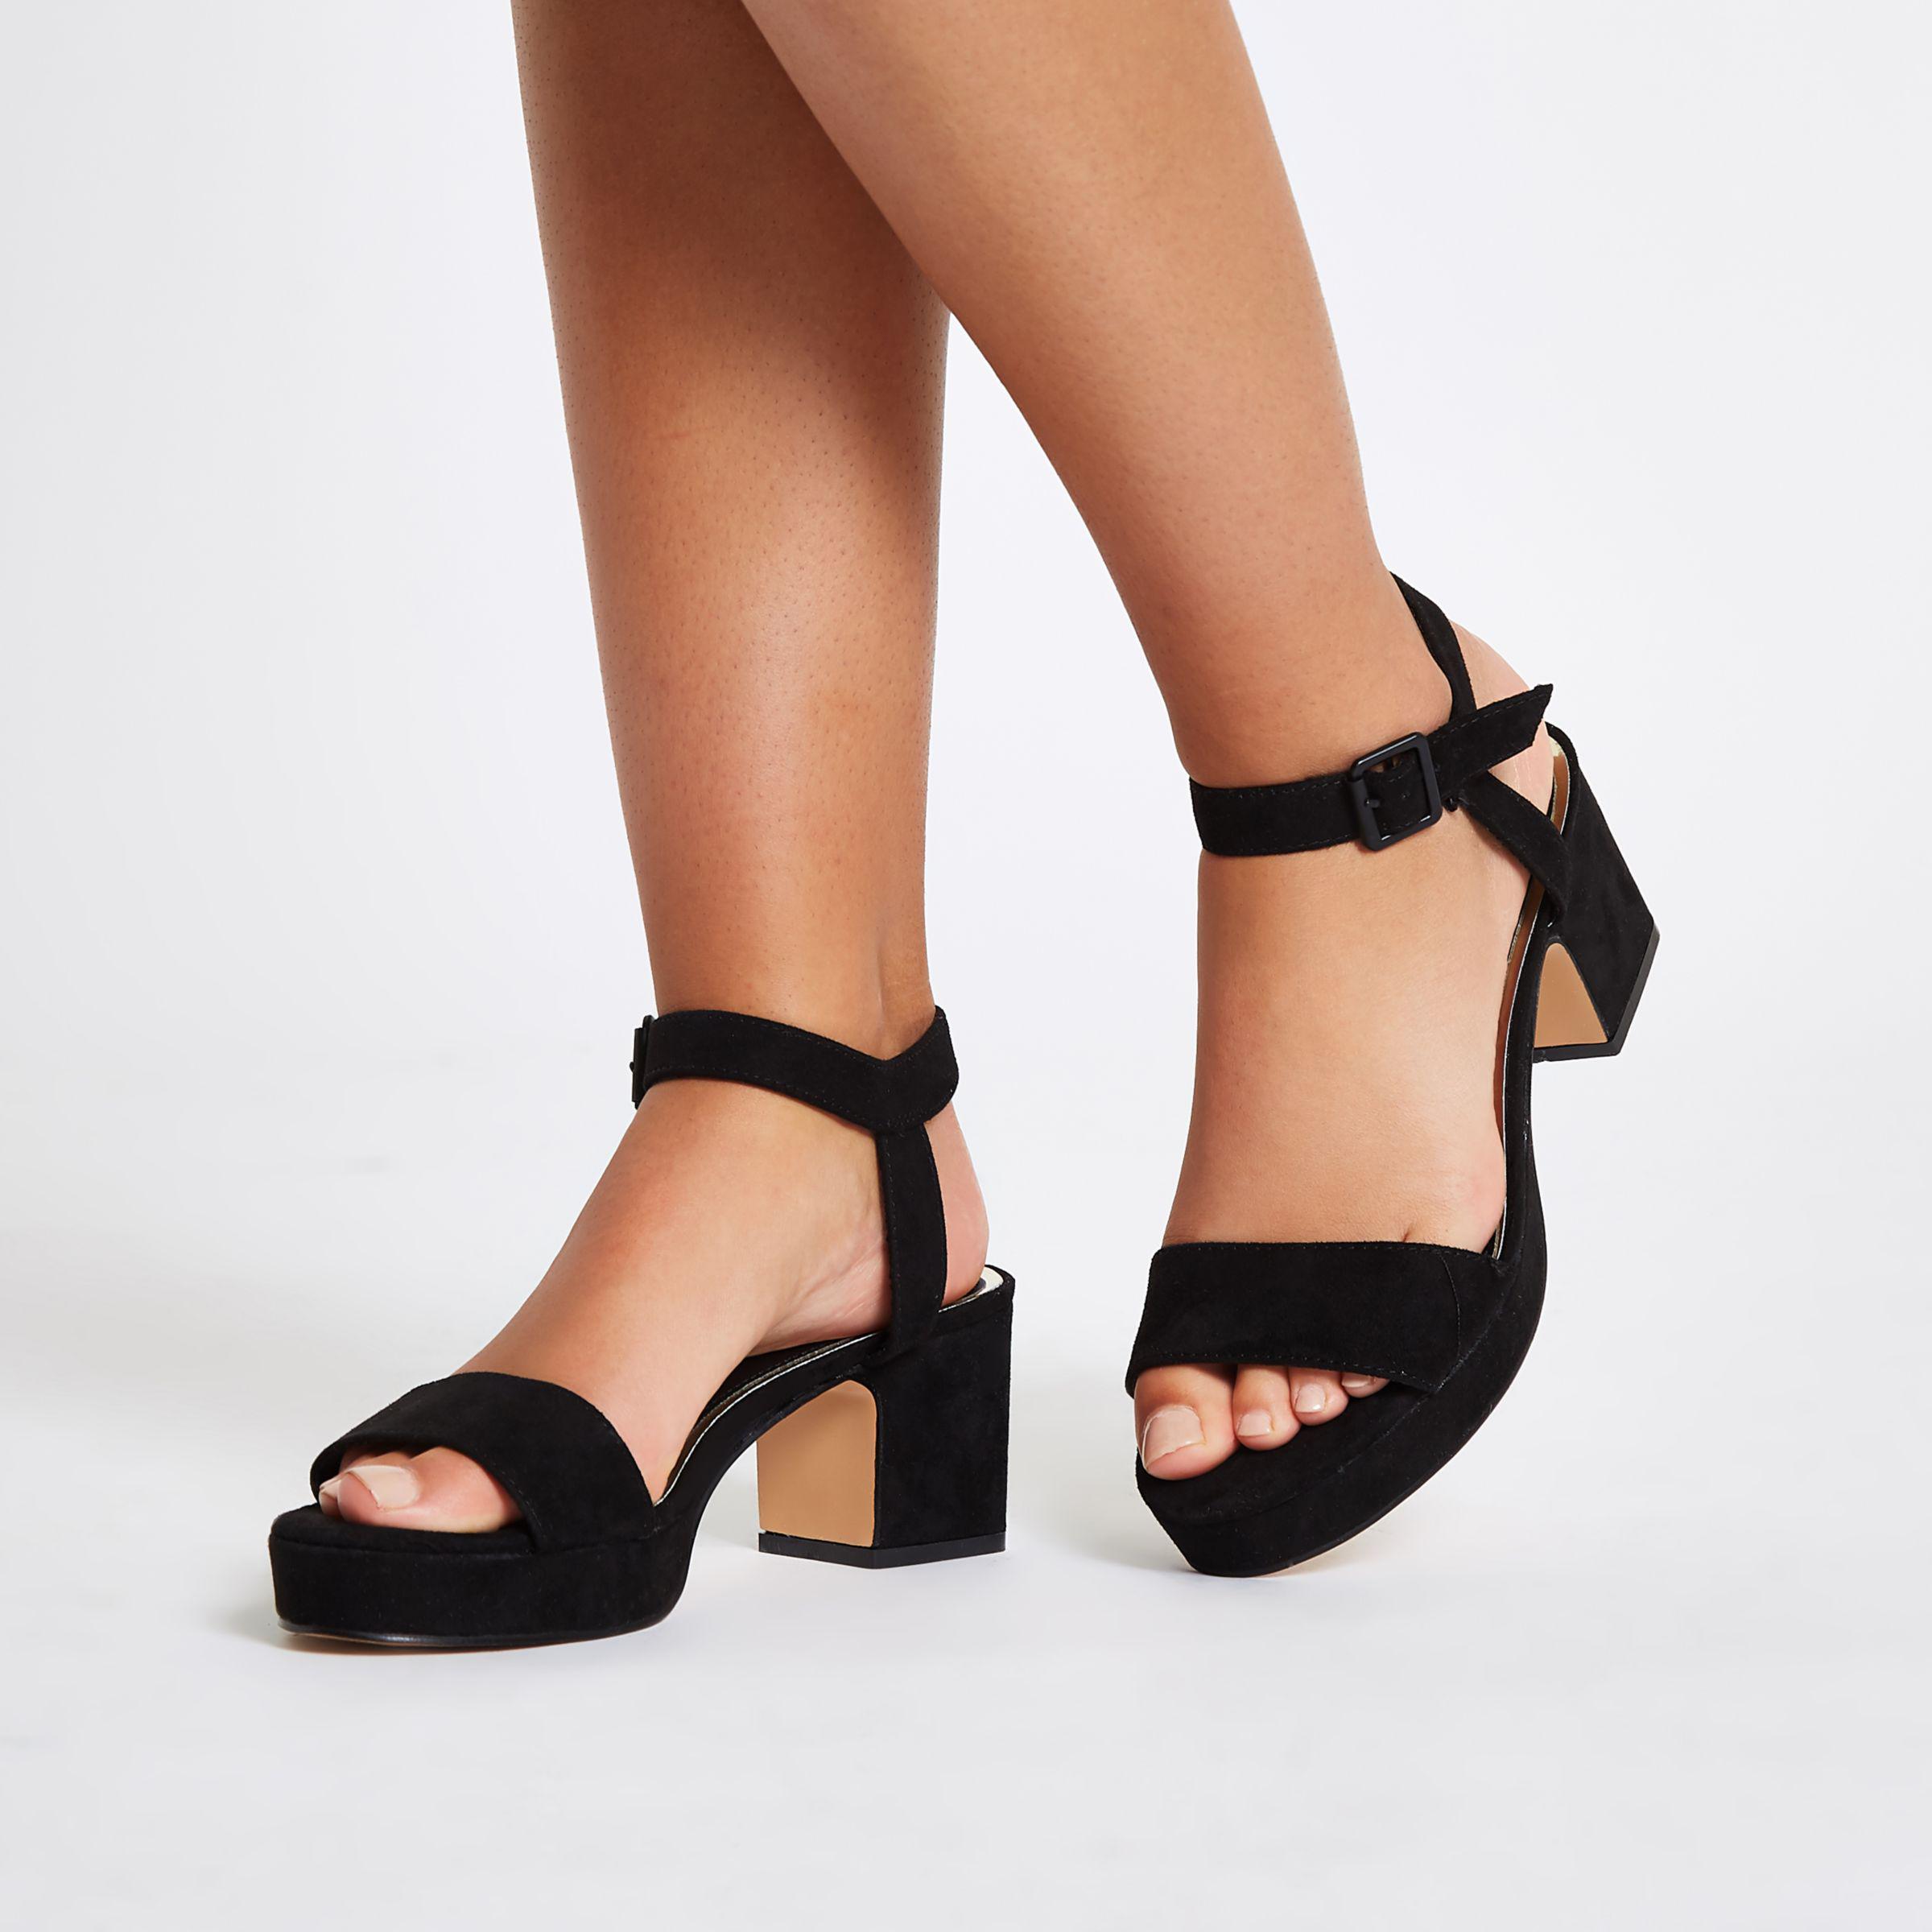 0e07e1a3a79 Lyst - River Island Black Open Toe Block Heel Sandals in Black